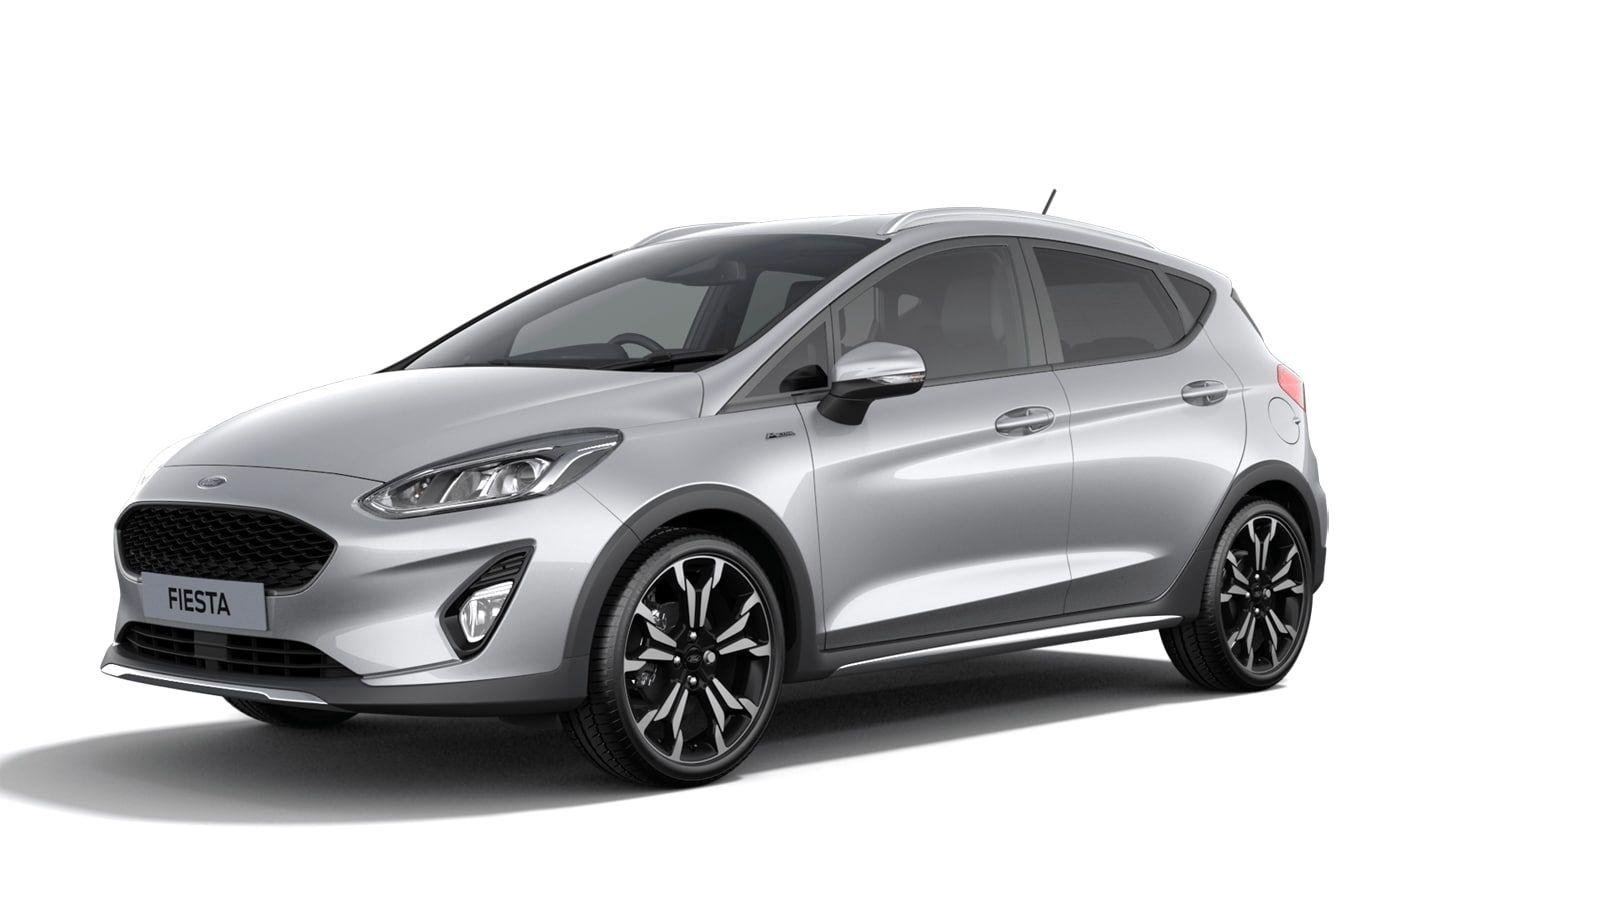 "Nieuw Ford All-new ford fiesta Active X 1.0i EcoBoost 125pk / 92kW A7 - 5d JK6 - Metaalkleur ""Moondust Silver"" 1"